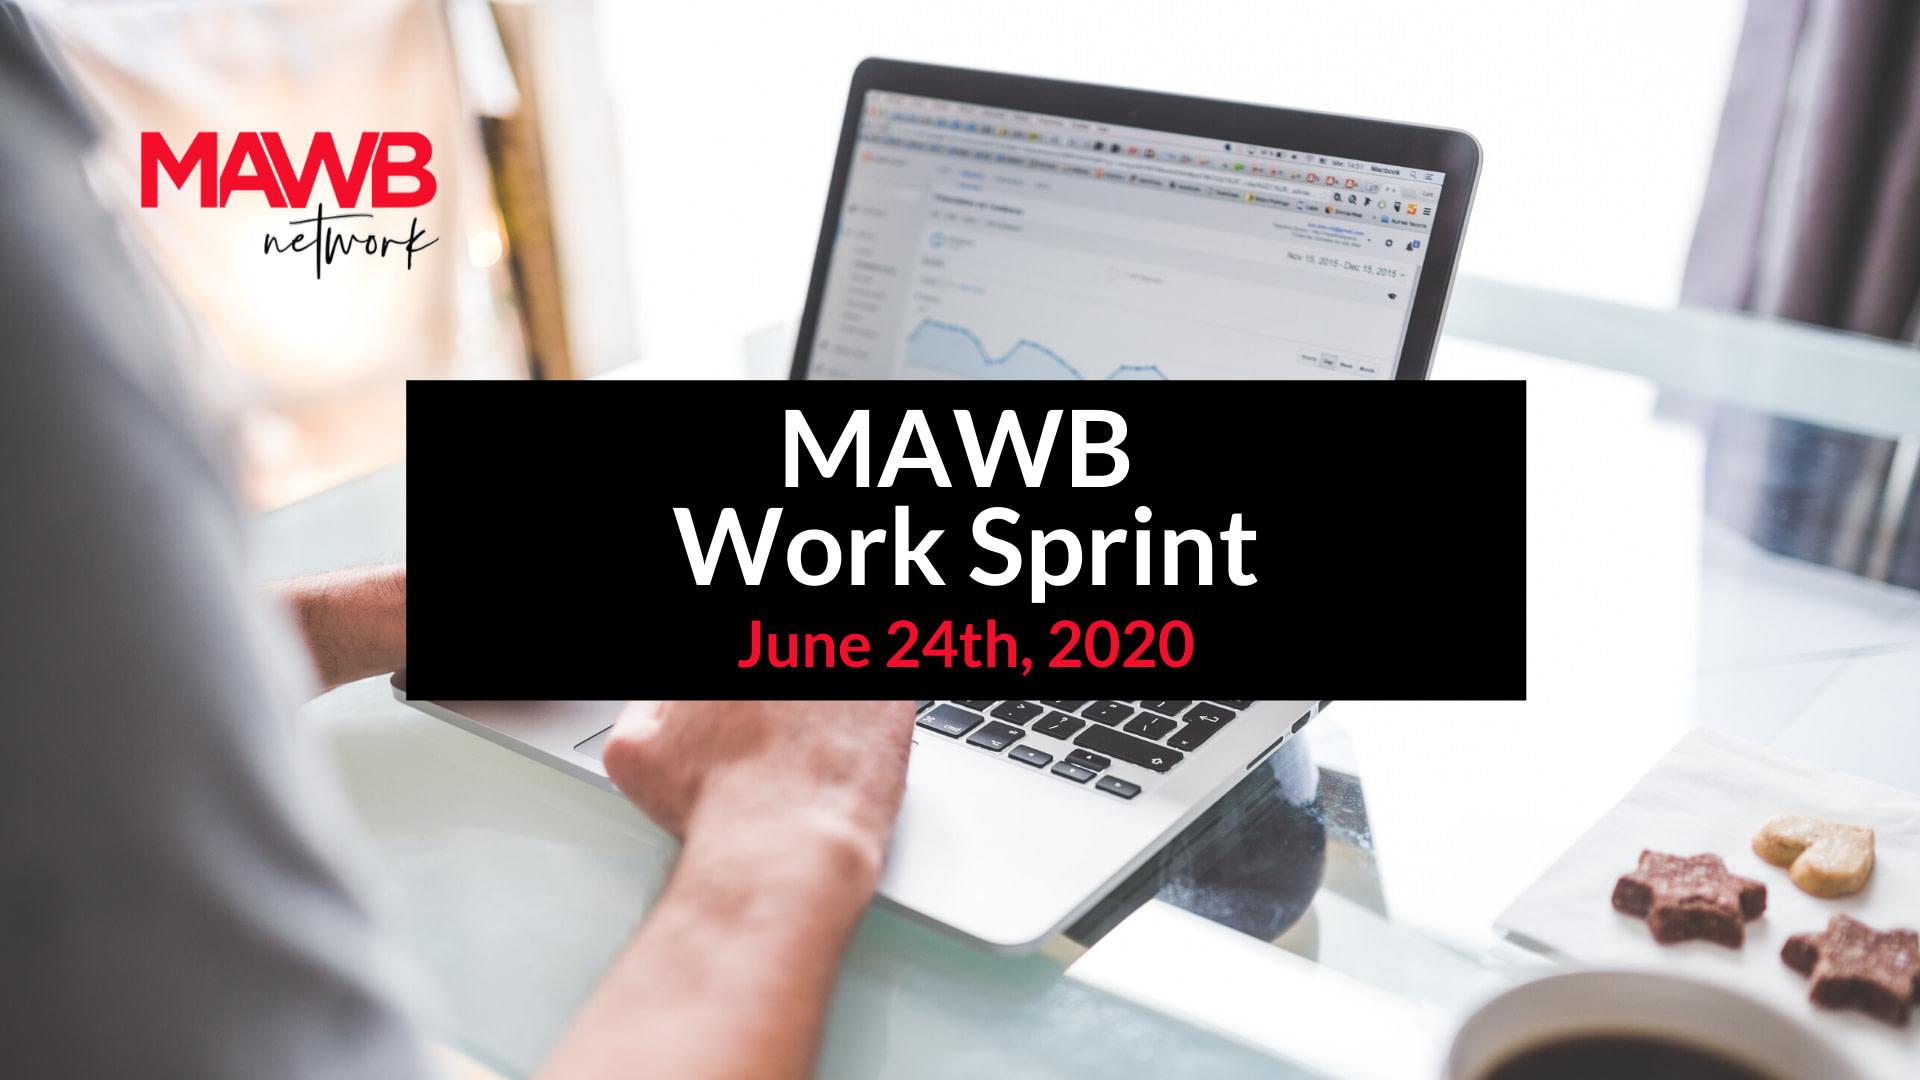 Facebook EVENT - MAWB Work Sprint - June 24th